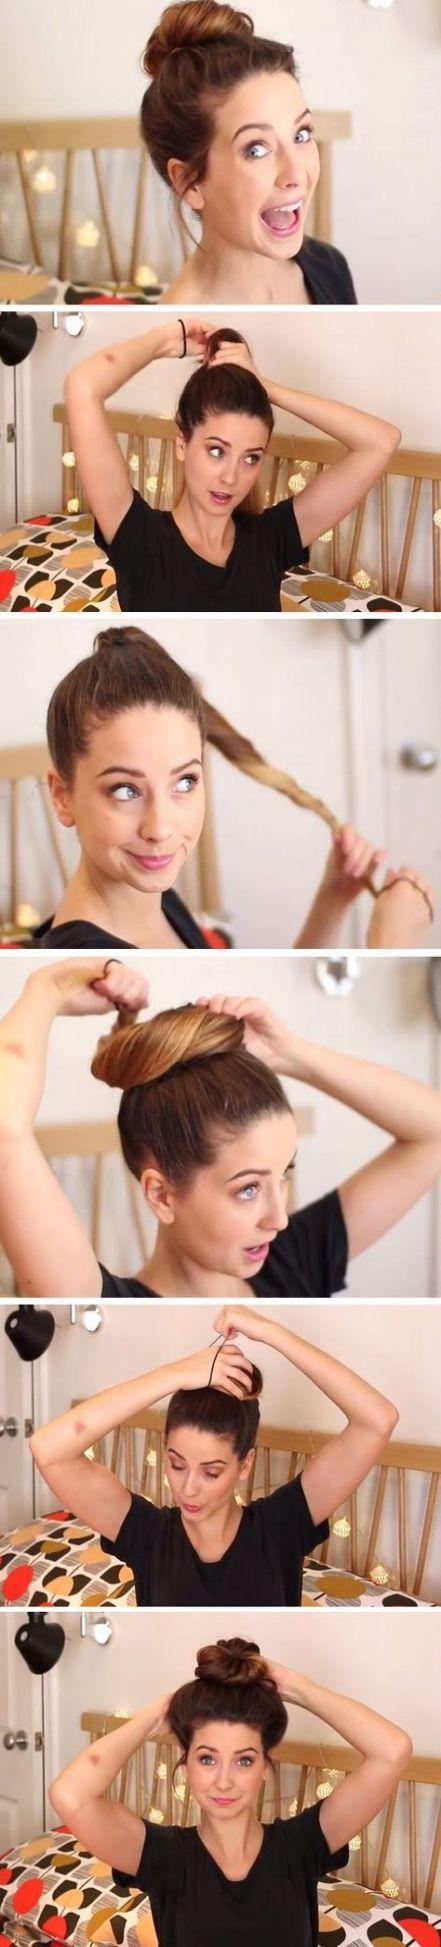 Hairstyles For School Tumblr Facebook 44+ Ideas